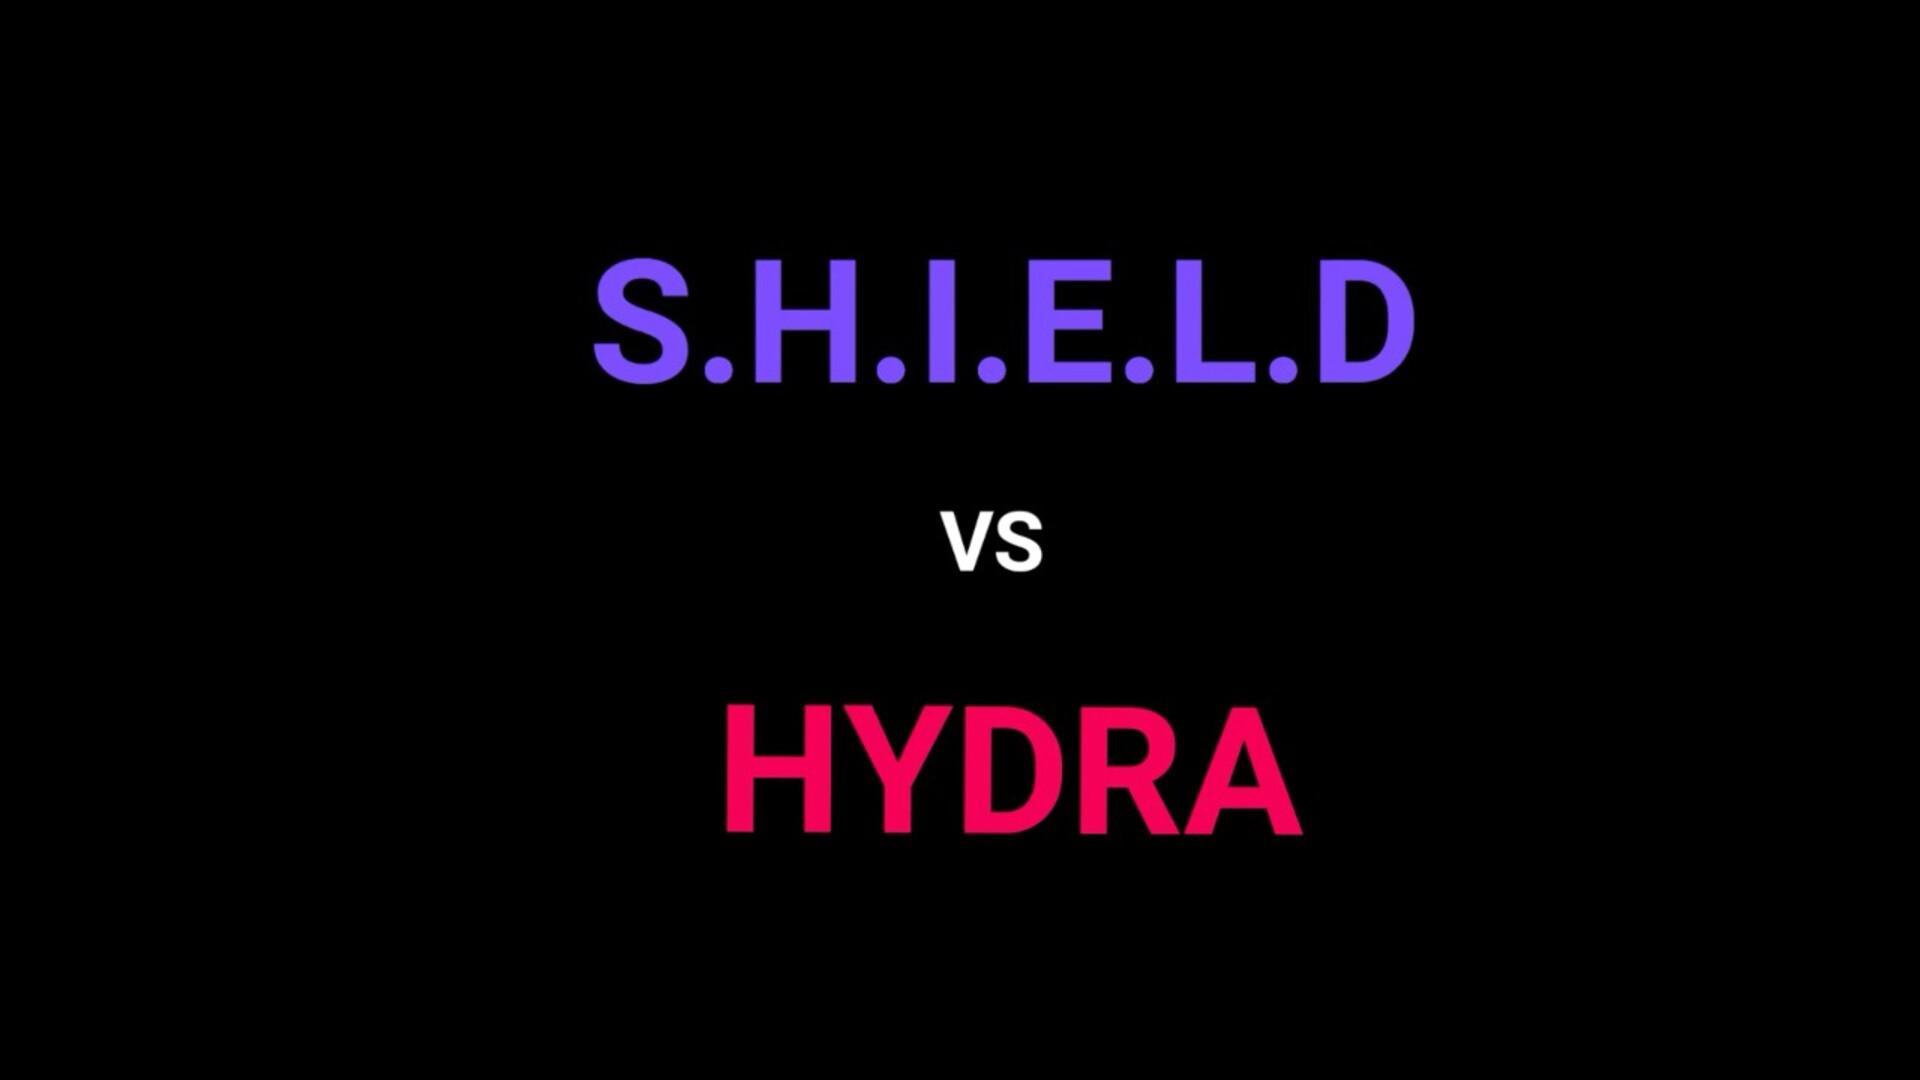 S.H.I.E.L.D    VS.     HYDRA